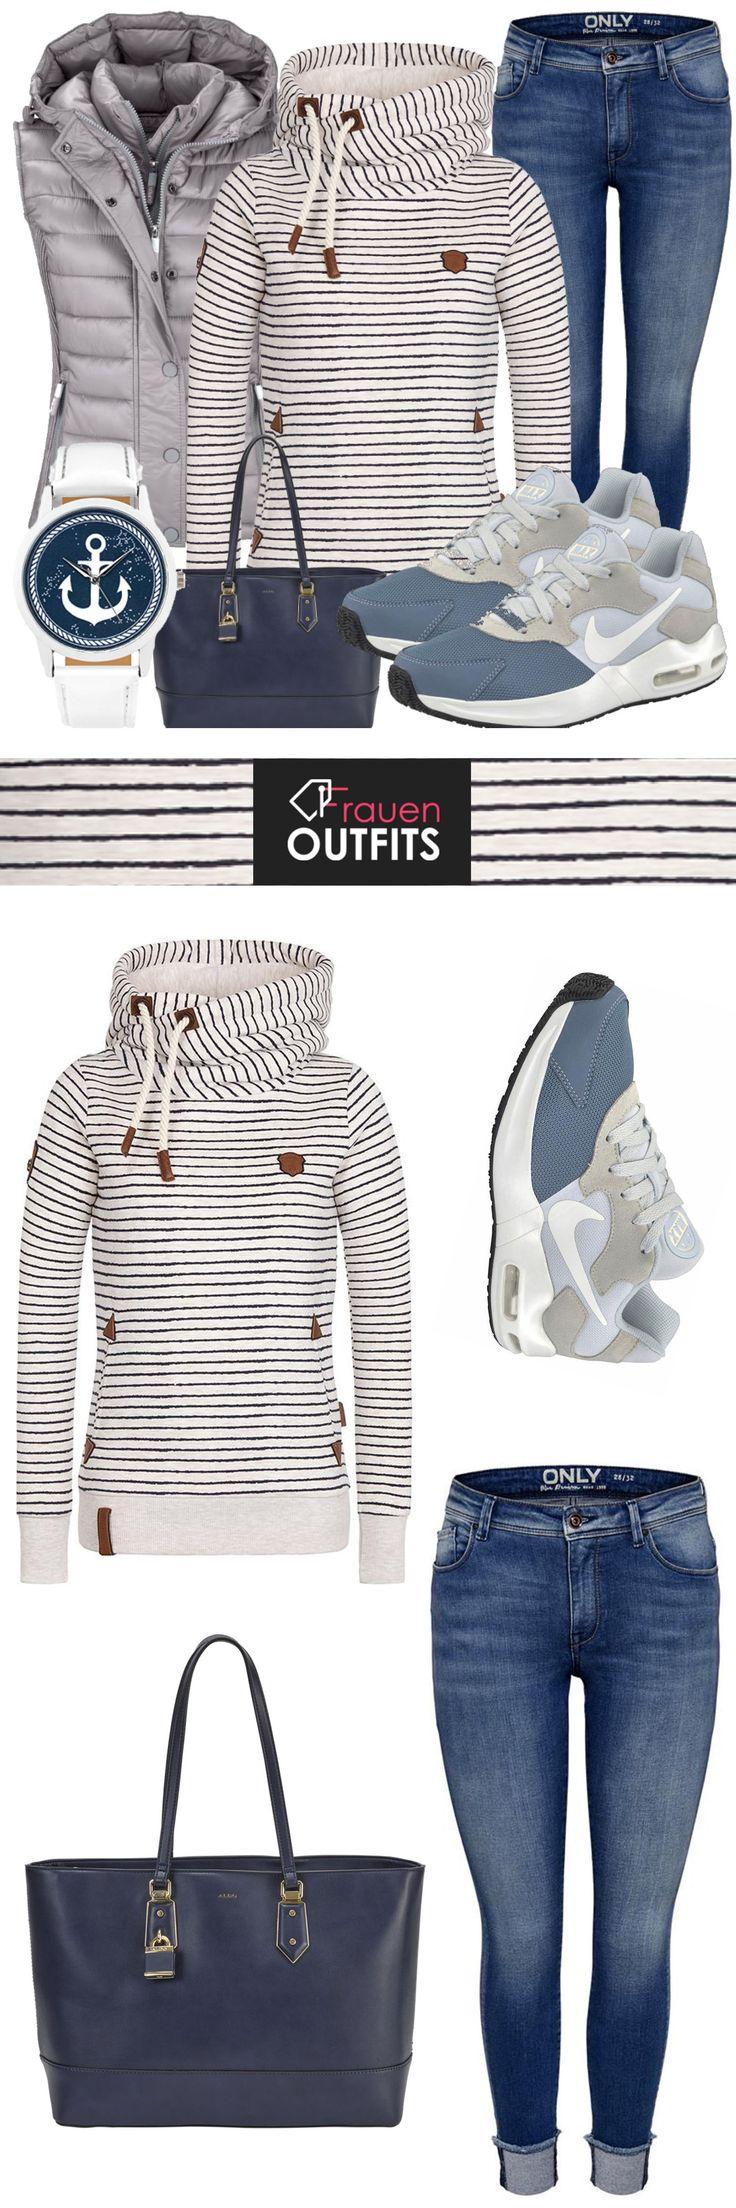 #freizeitoutfit #frauenoutfit #damenoutfit #casual #streetstyle #alltag #freizeit #sneaker #sportlich #jeans #pulli #damenmode #frauenmode #modefürfrauen #outfitinspiration #nike #naketano – FrauenOutfits.de